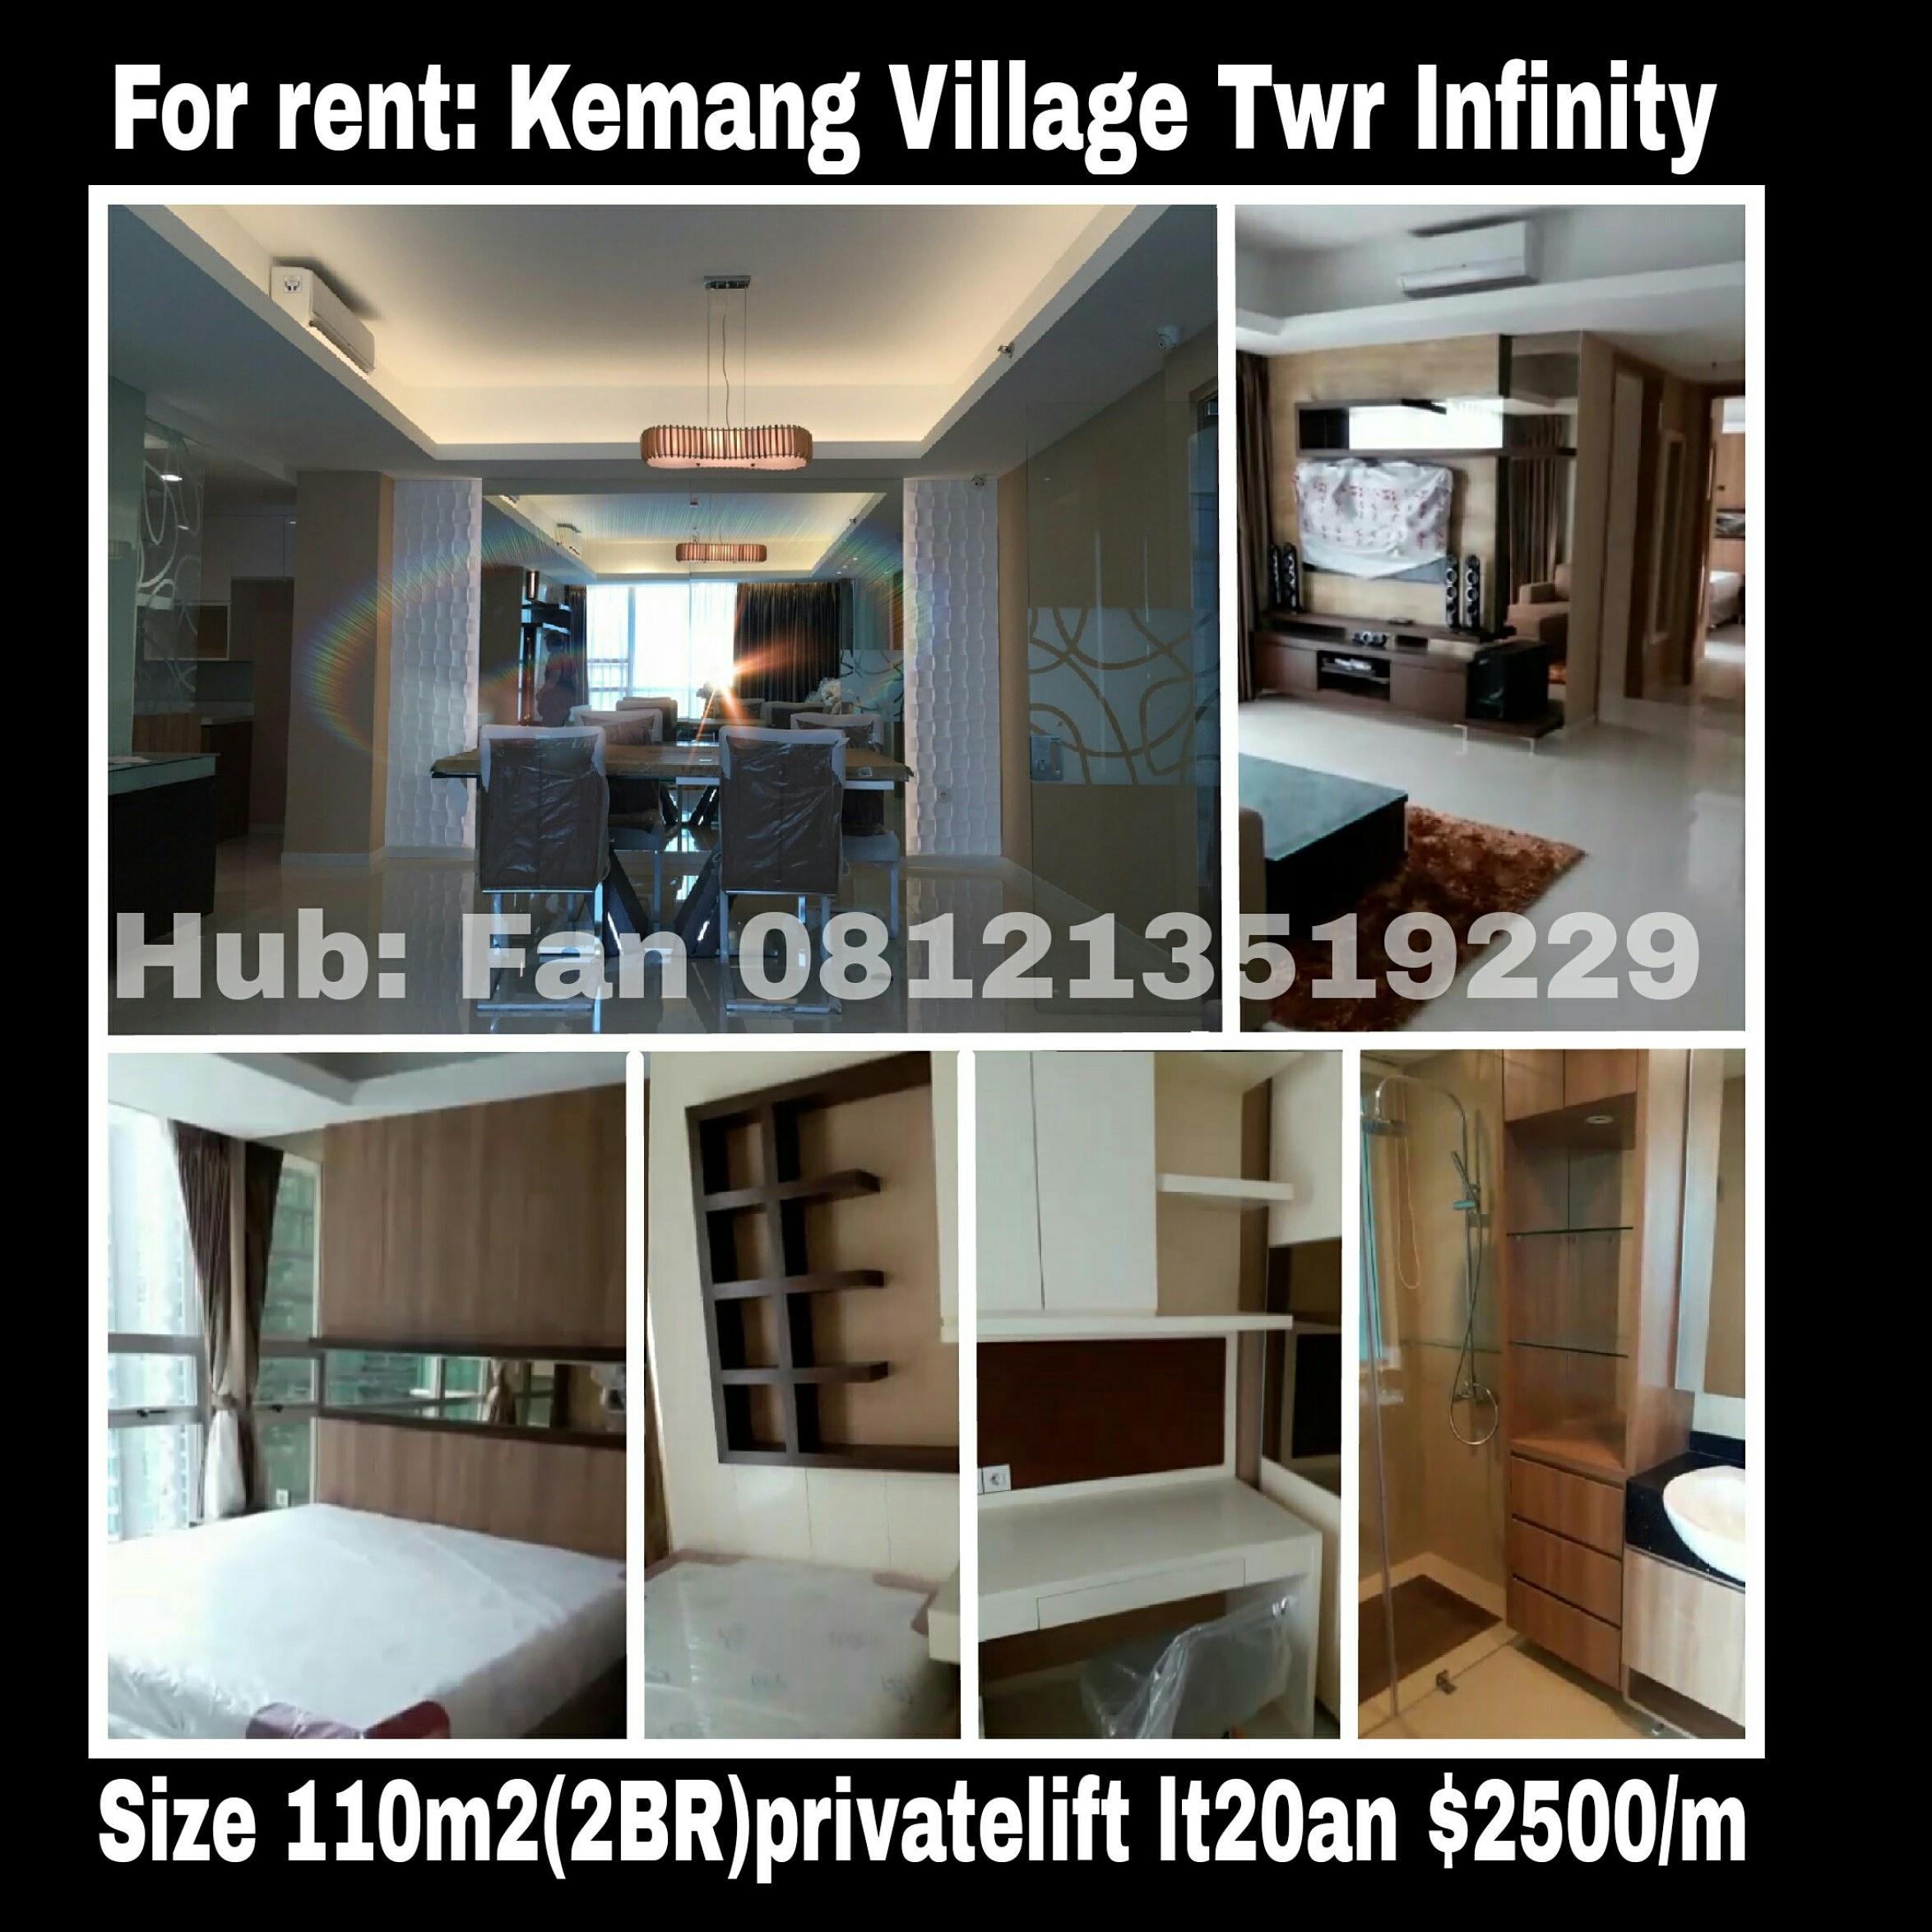 Apt Kemang Village Infinity sewa 2BR.jpg